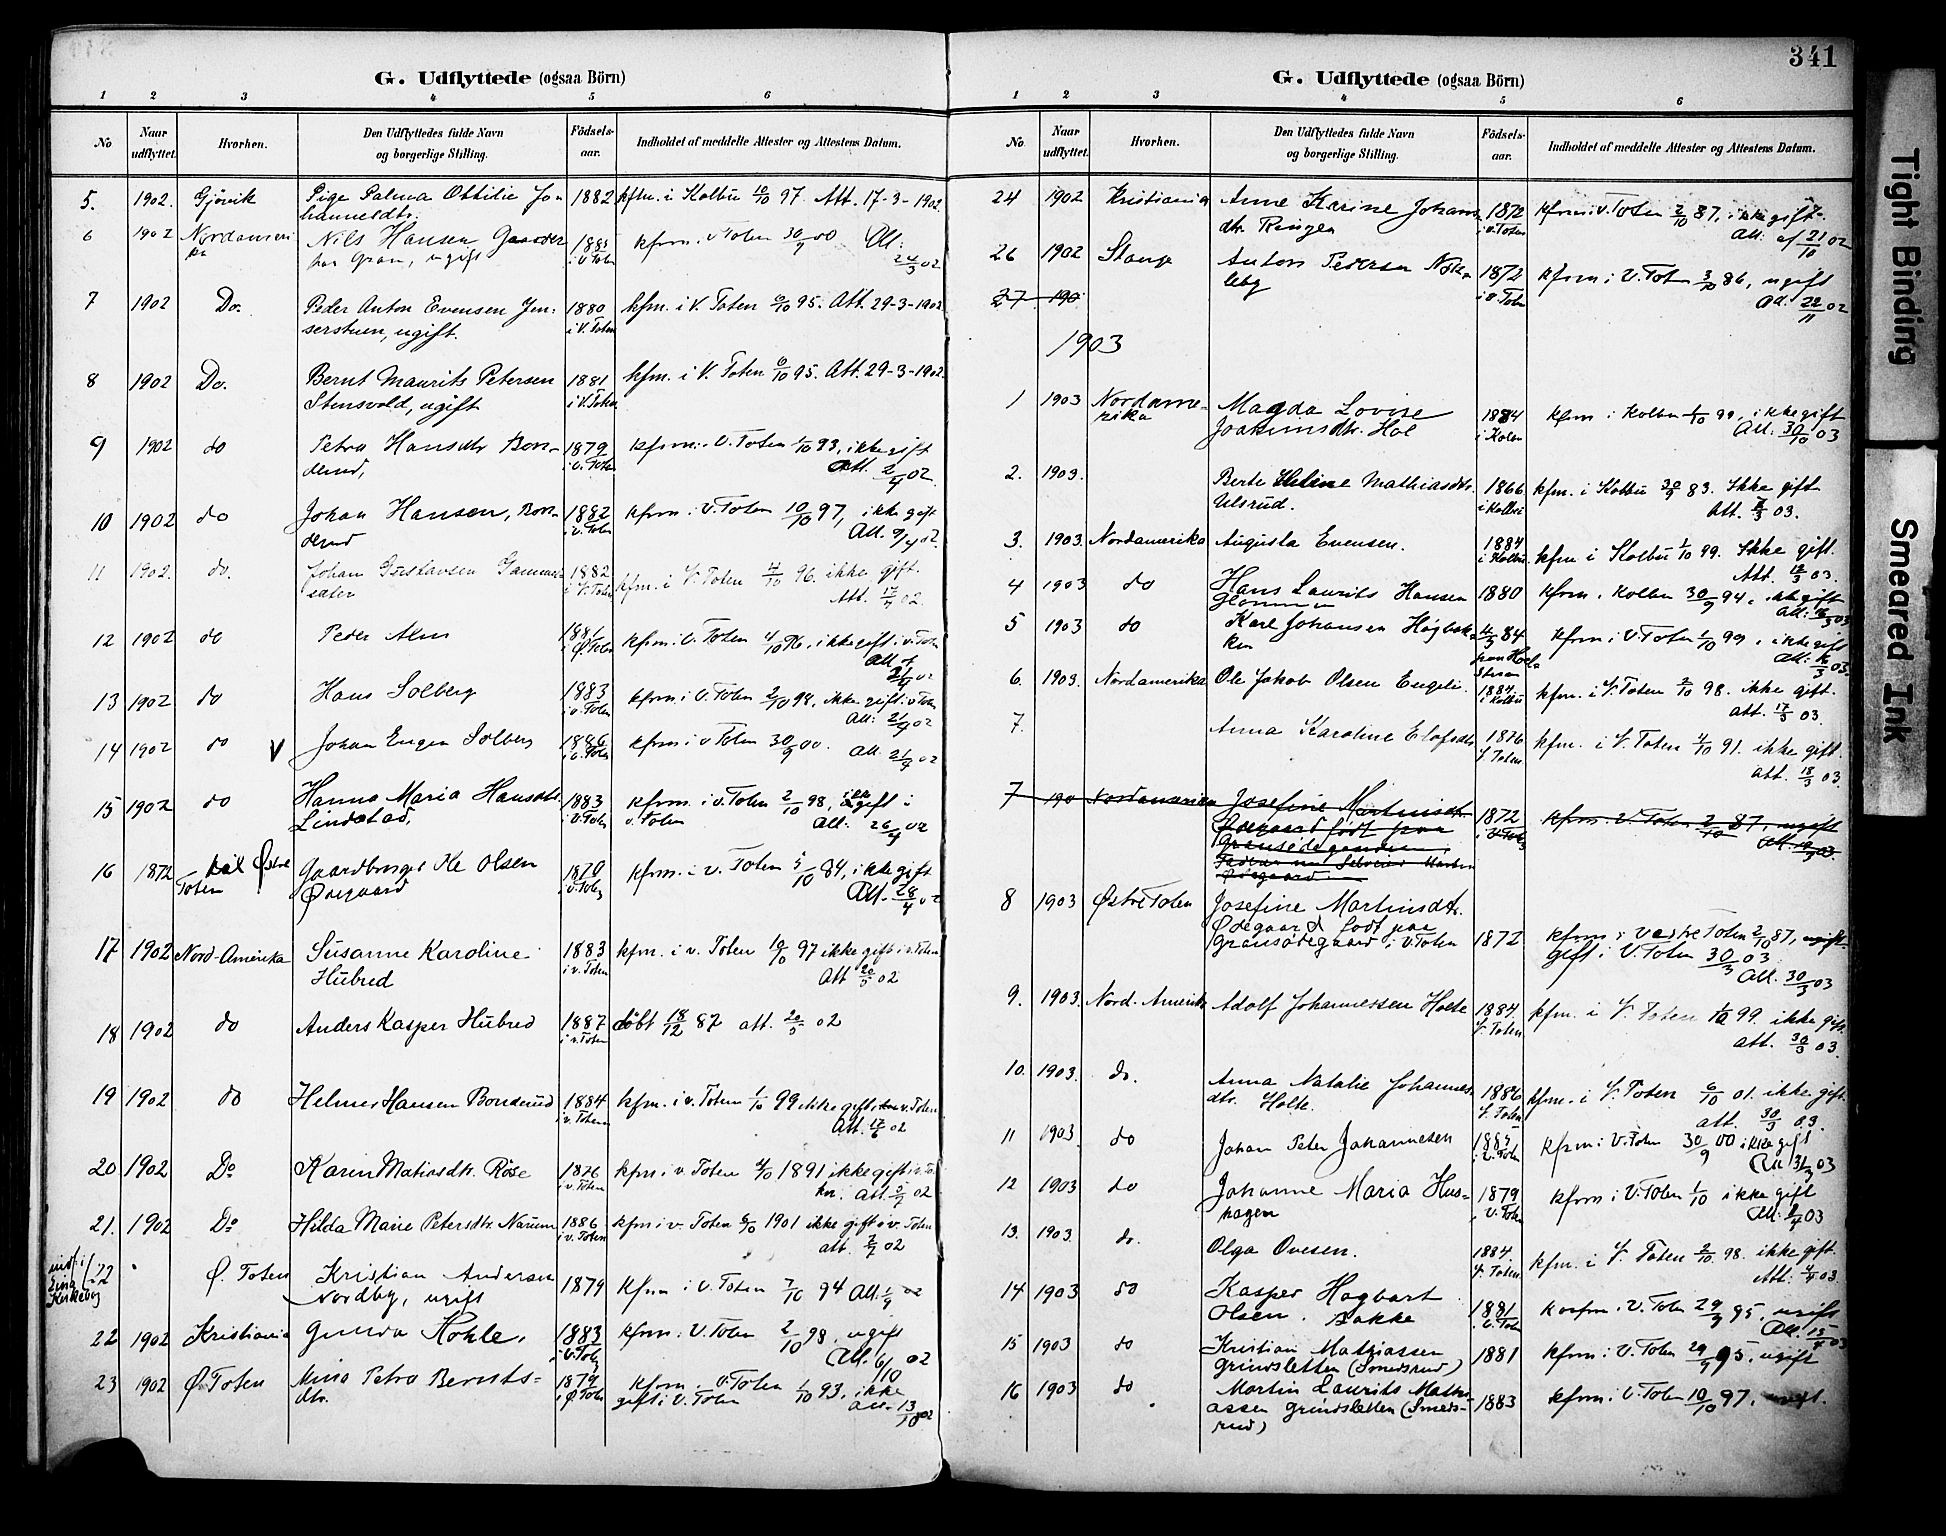 SAH, Vestre Toten prestekontor, H/Ha/Haa/L0013: Parish register (official) no. 13, 1895-1911, p. 341